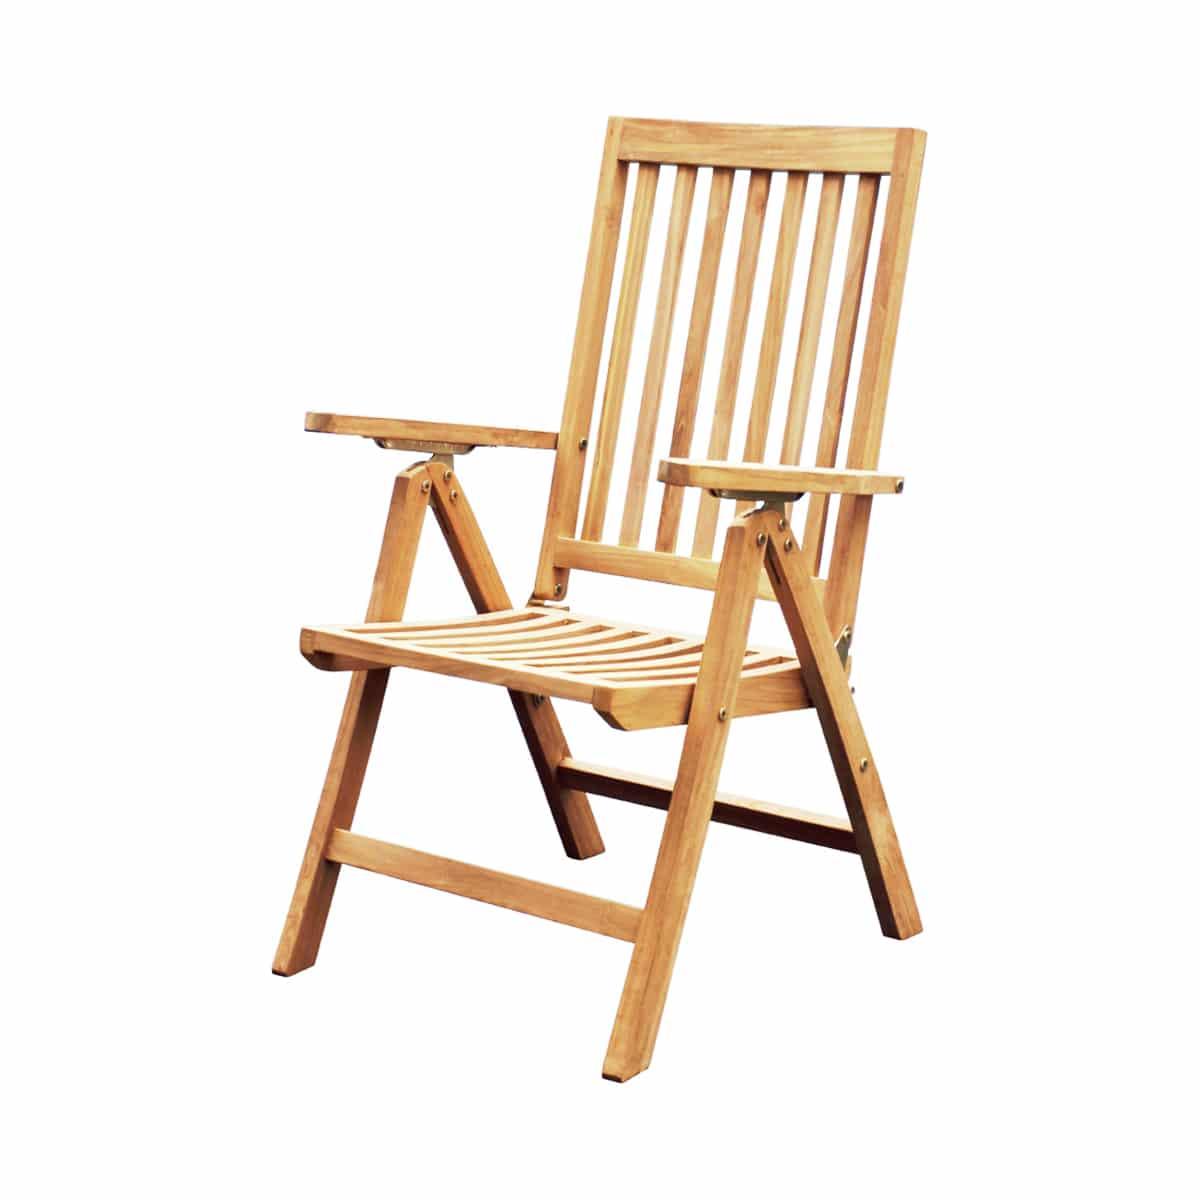 Srm Furnitures: Teak Garden Folding Chair - GCH07